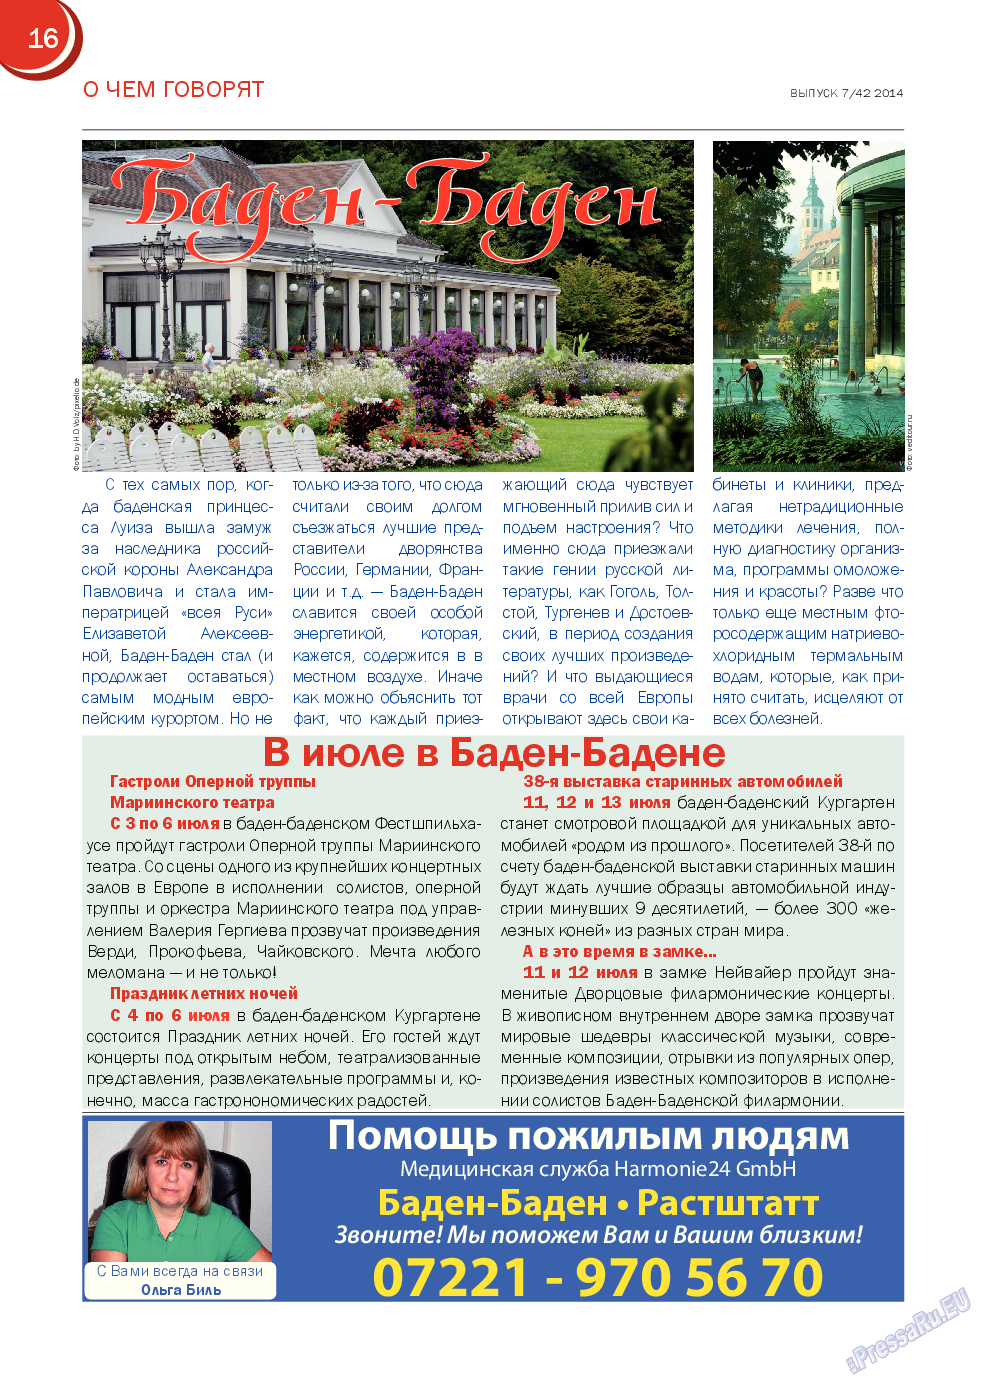 Русский Баден-Вюртемберг (журнал). 2014 год, номер 42, стр. 16